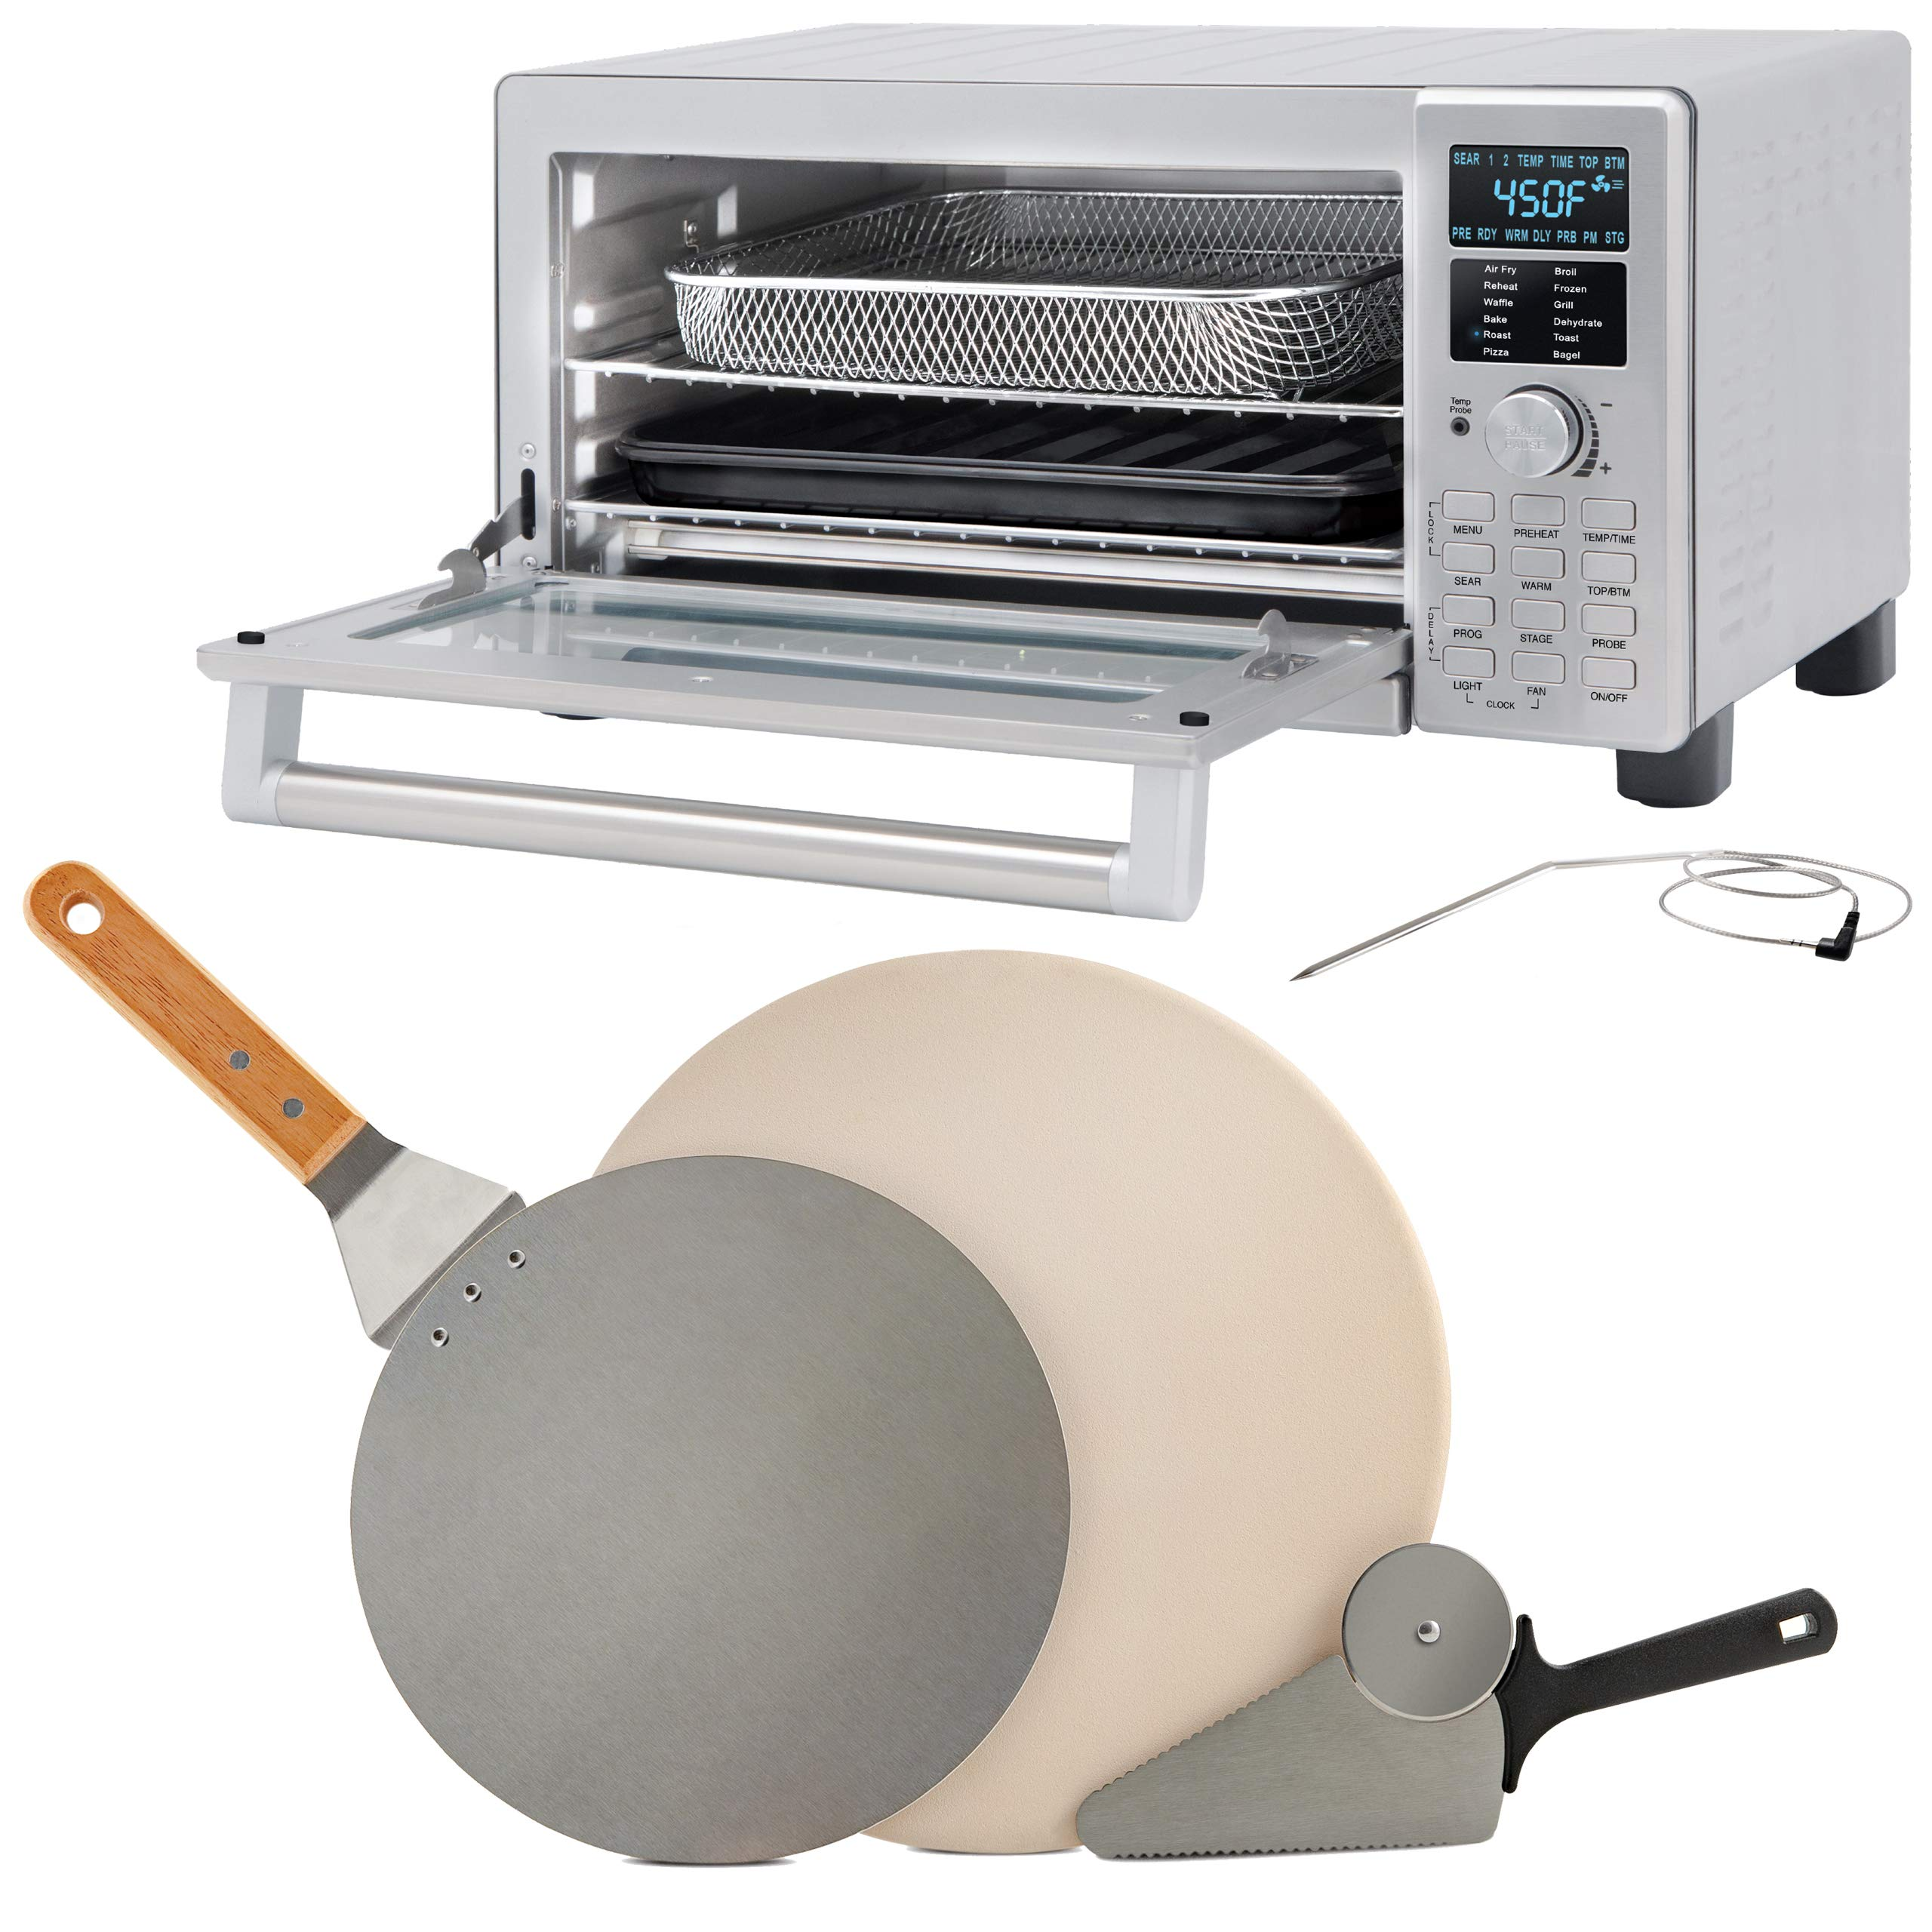 NUWAVE Bravo XL 1800-watt Smart Air Fryer Convection Oven with 3-piece Brick Oven-Style Pizza Kit